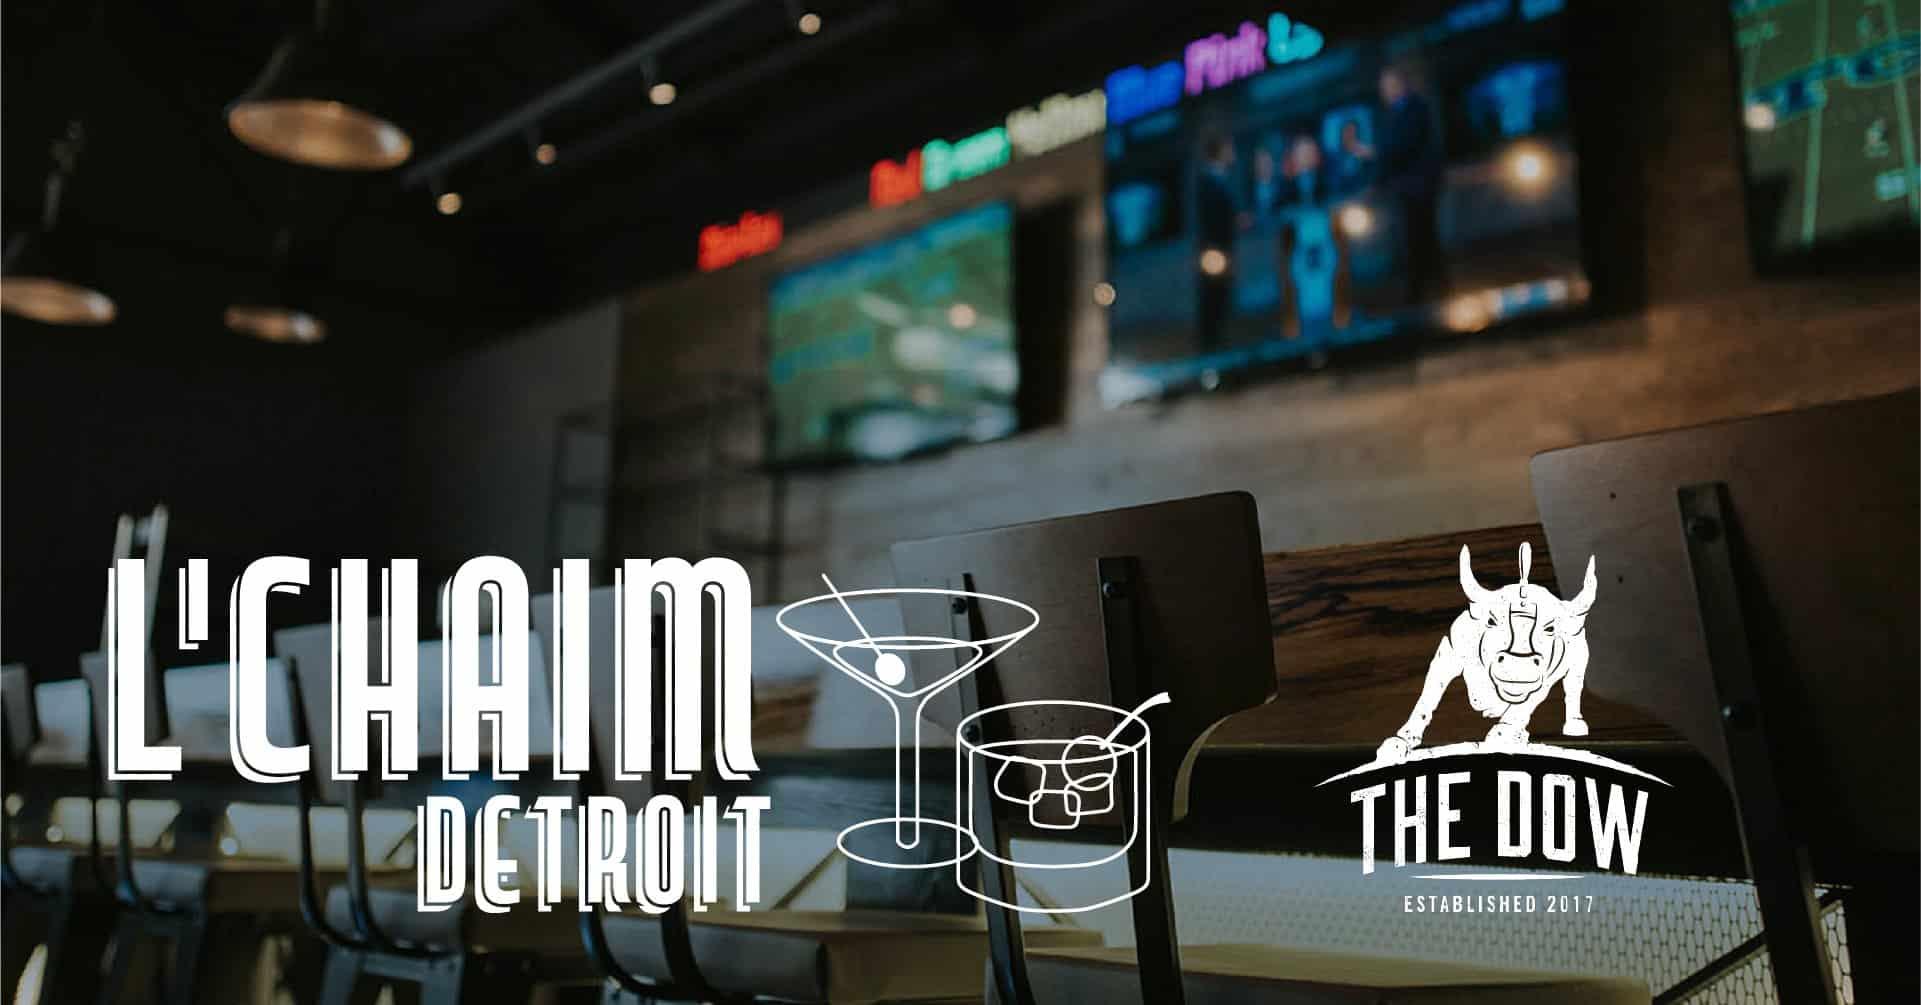 L'Chaim Detroit at The Dow